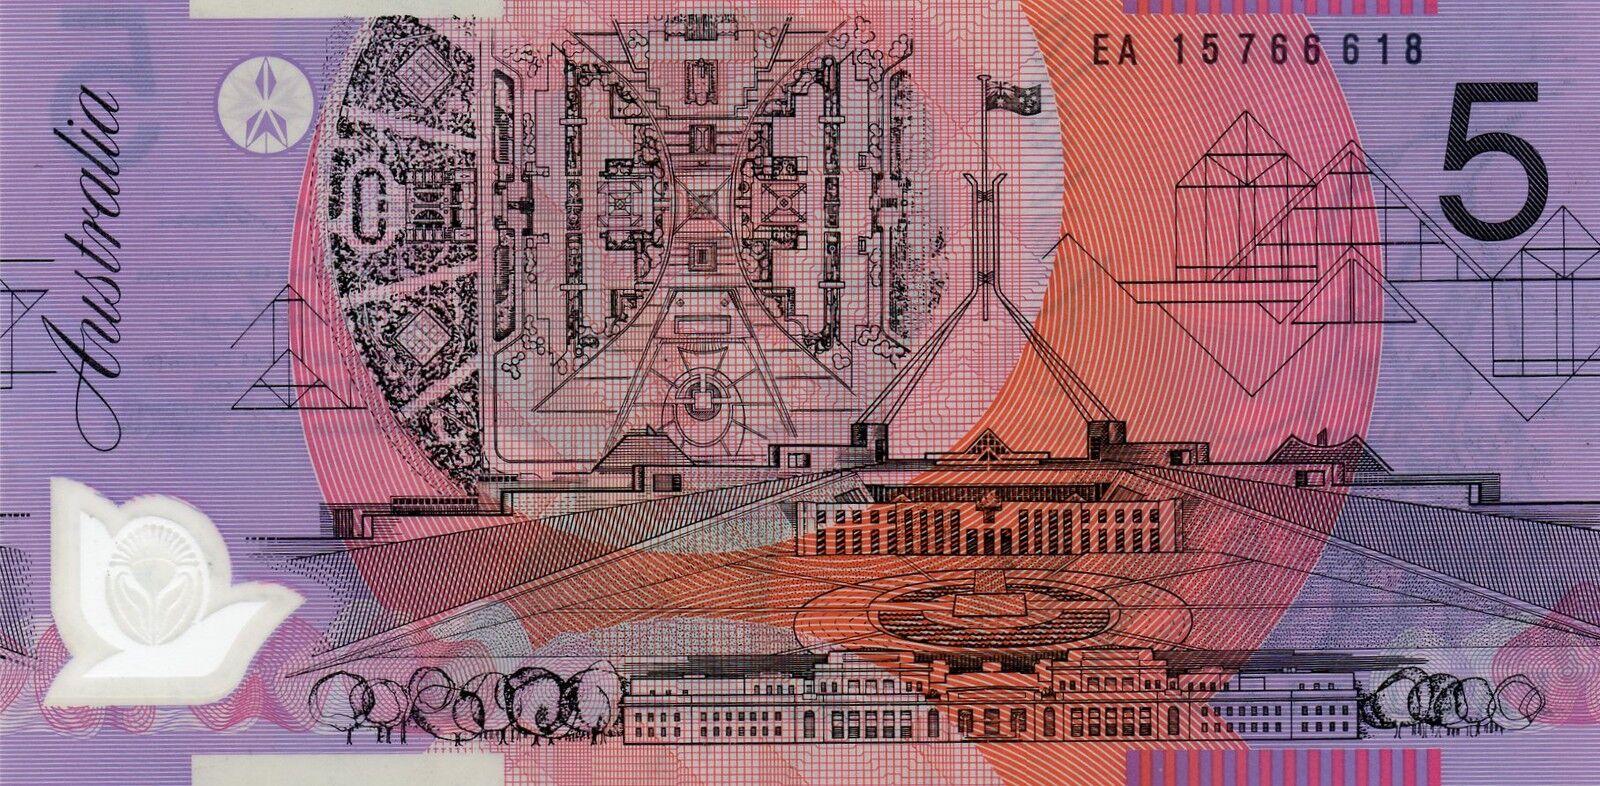 Church of Banknotes